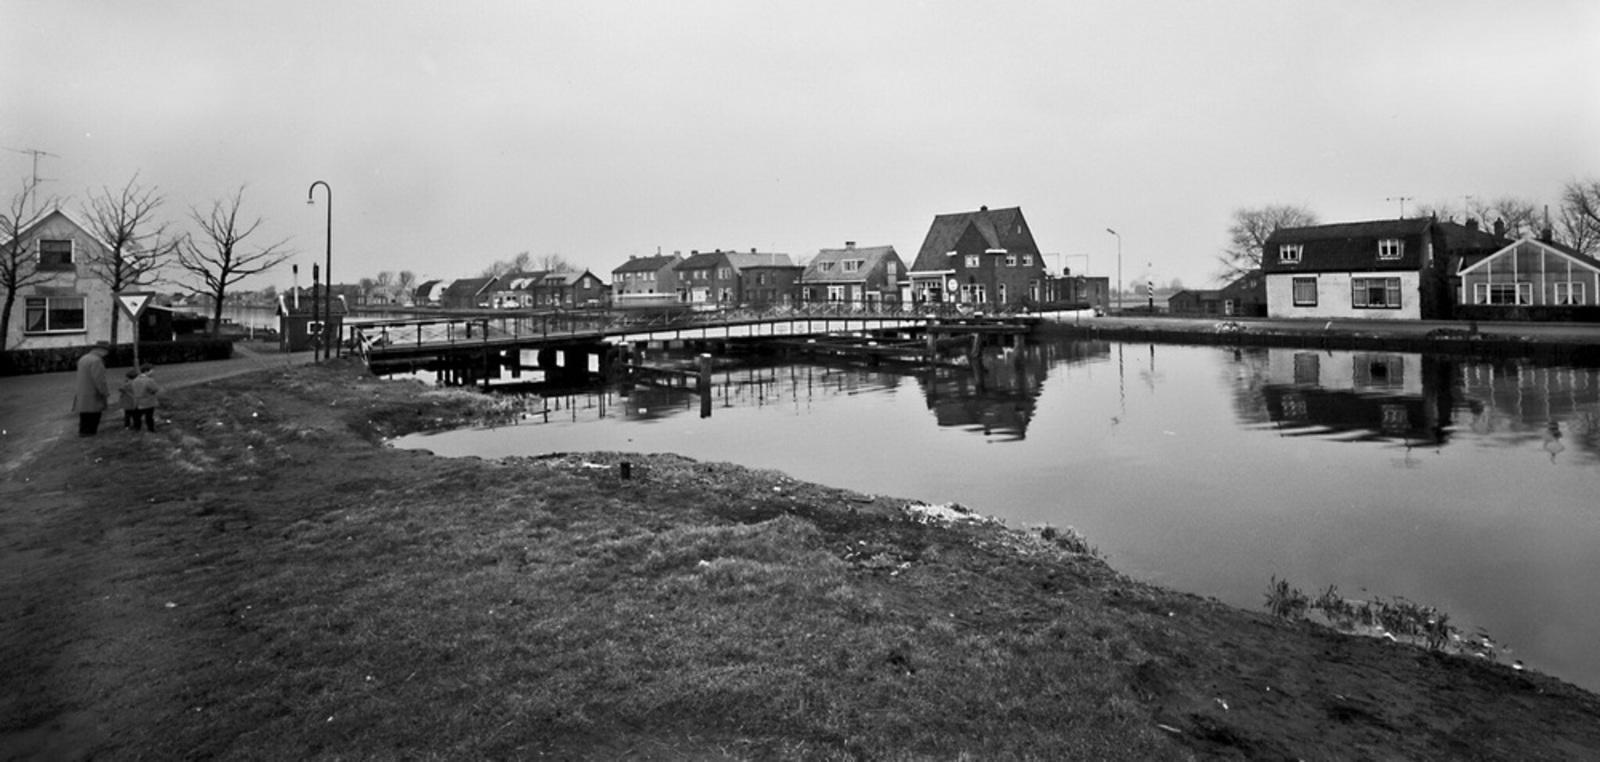 Lisserdijk 0530± 1960± Lisserbrug